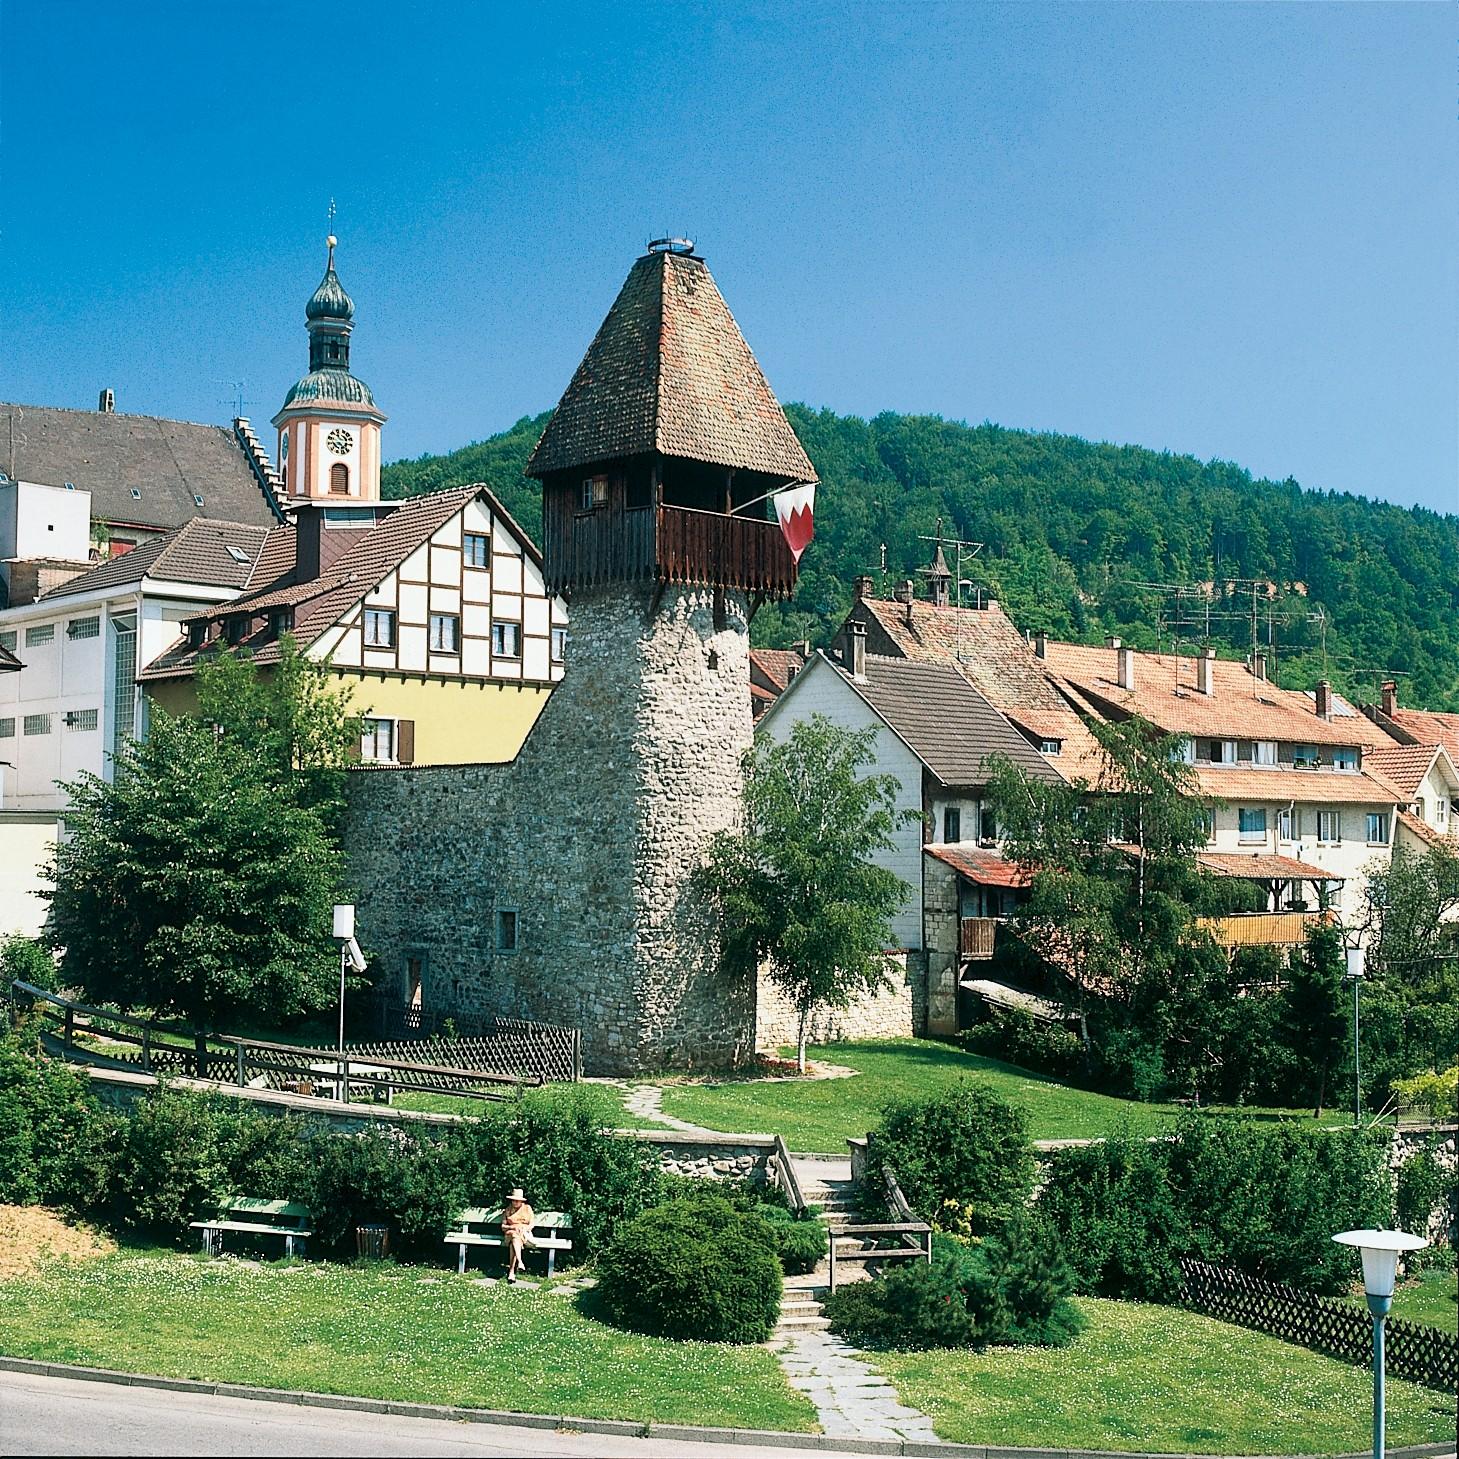 Storchenturm und Kirche Maria Himmelfahrt